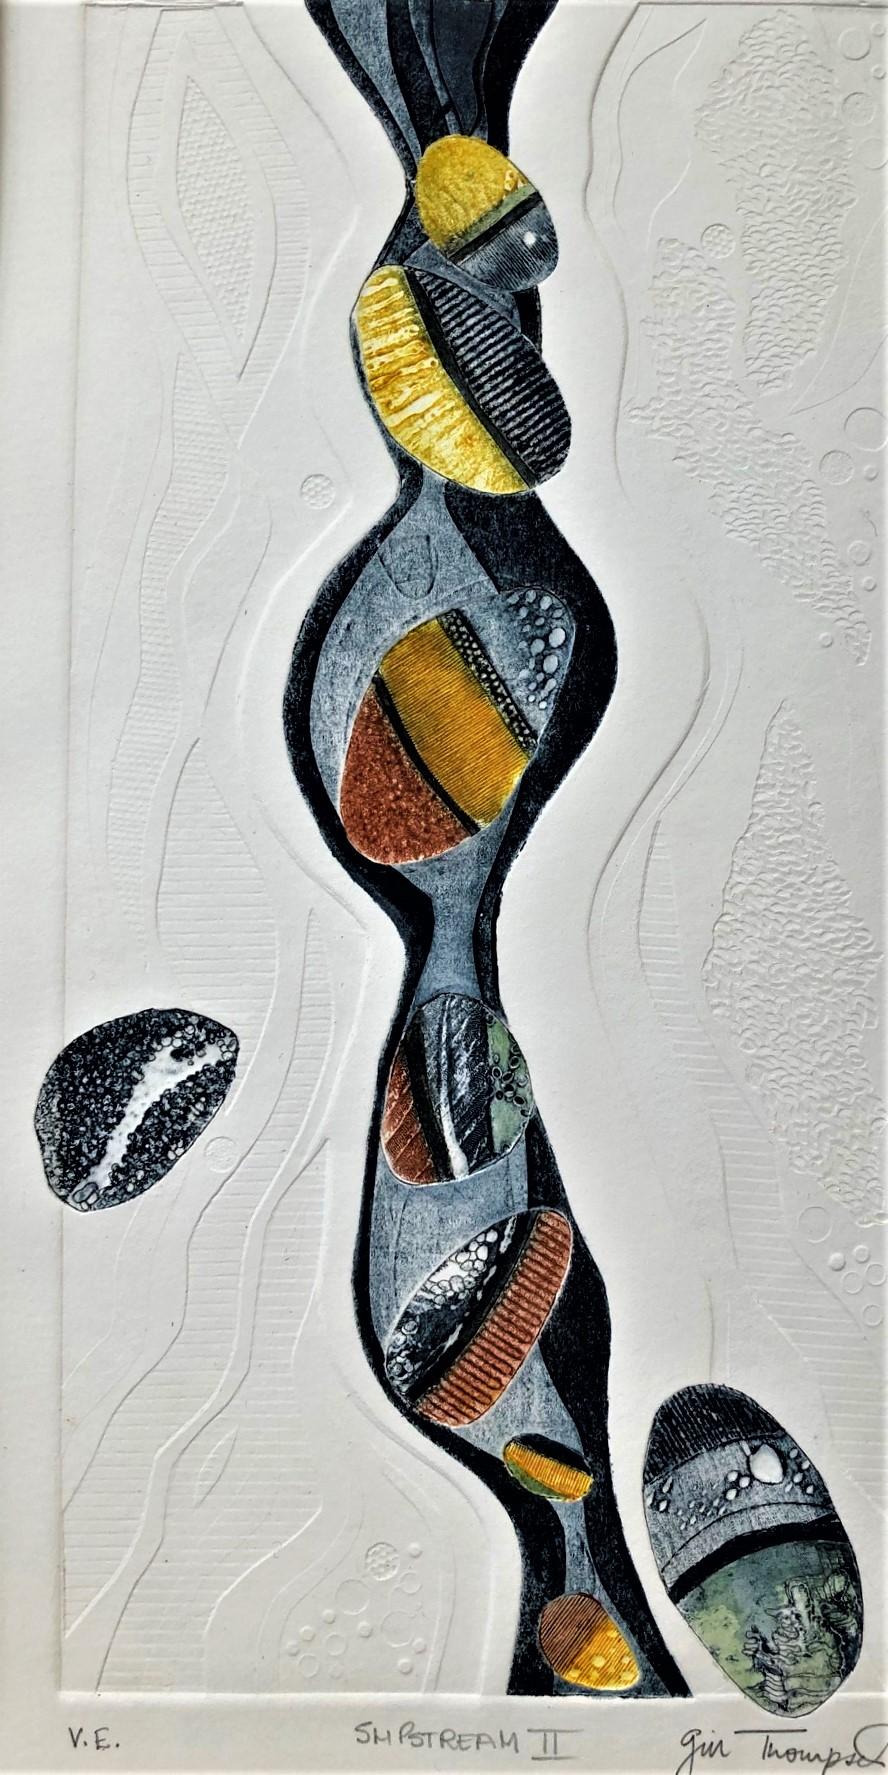 Gill Thompson. Slipstream 2 - collograph print